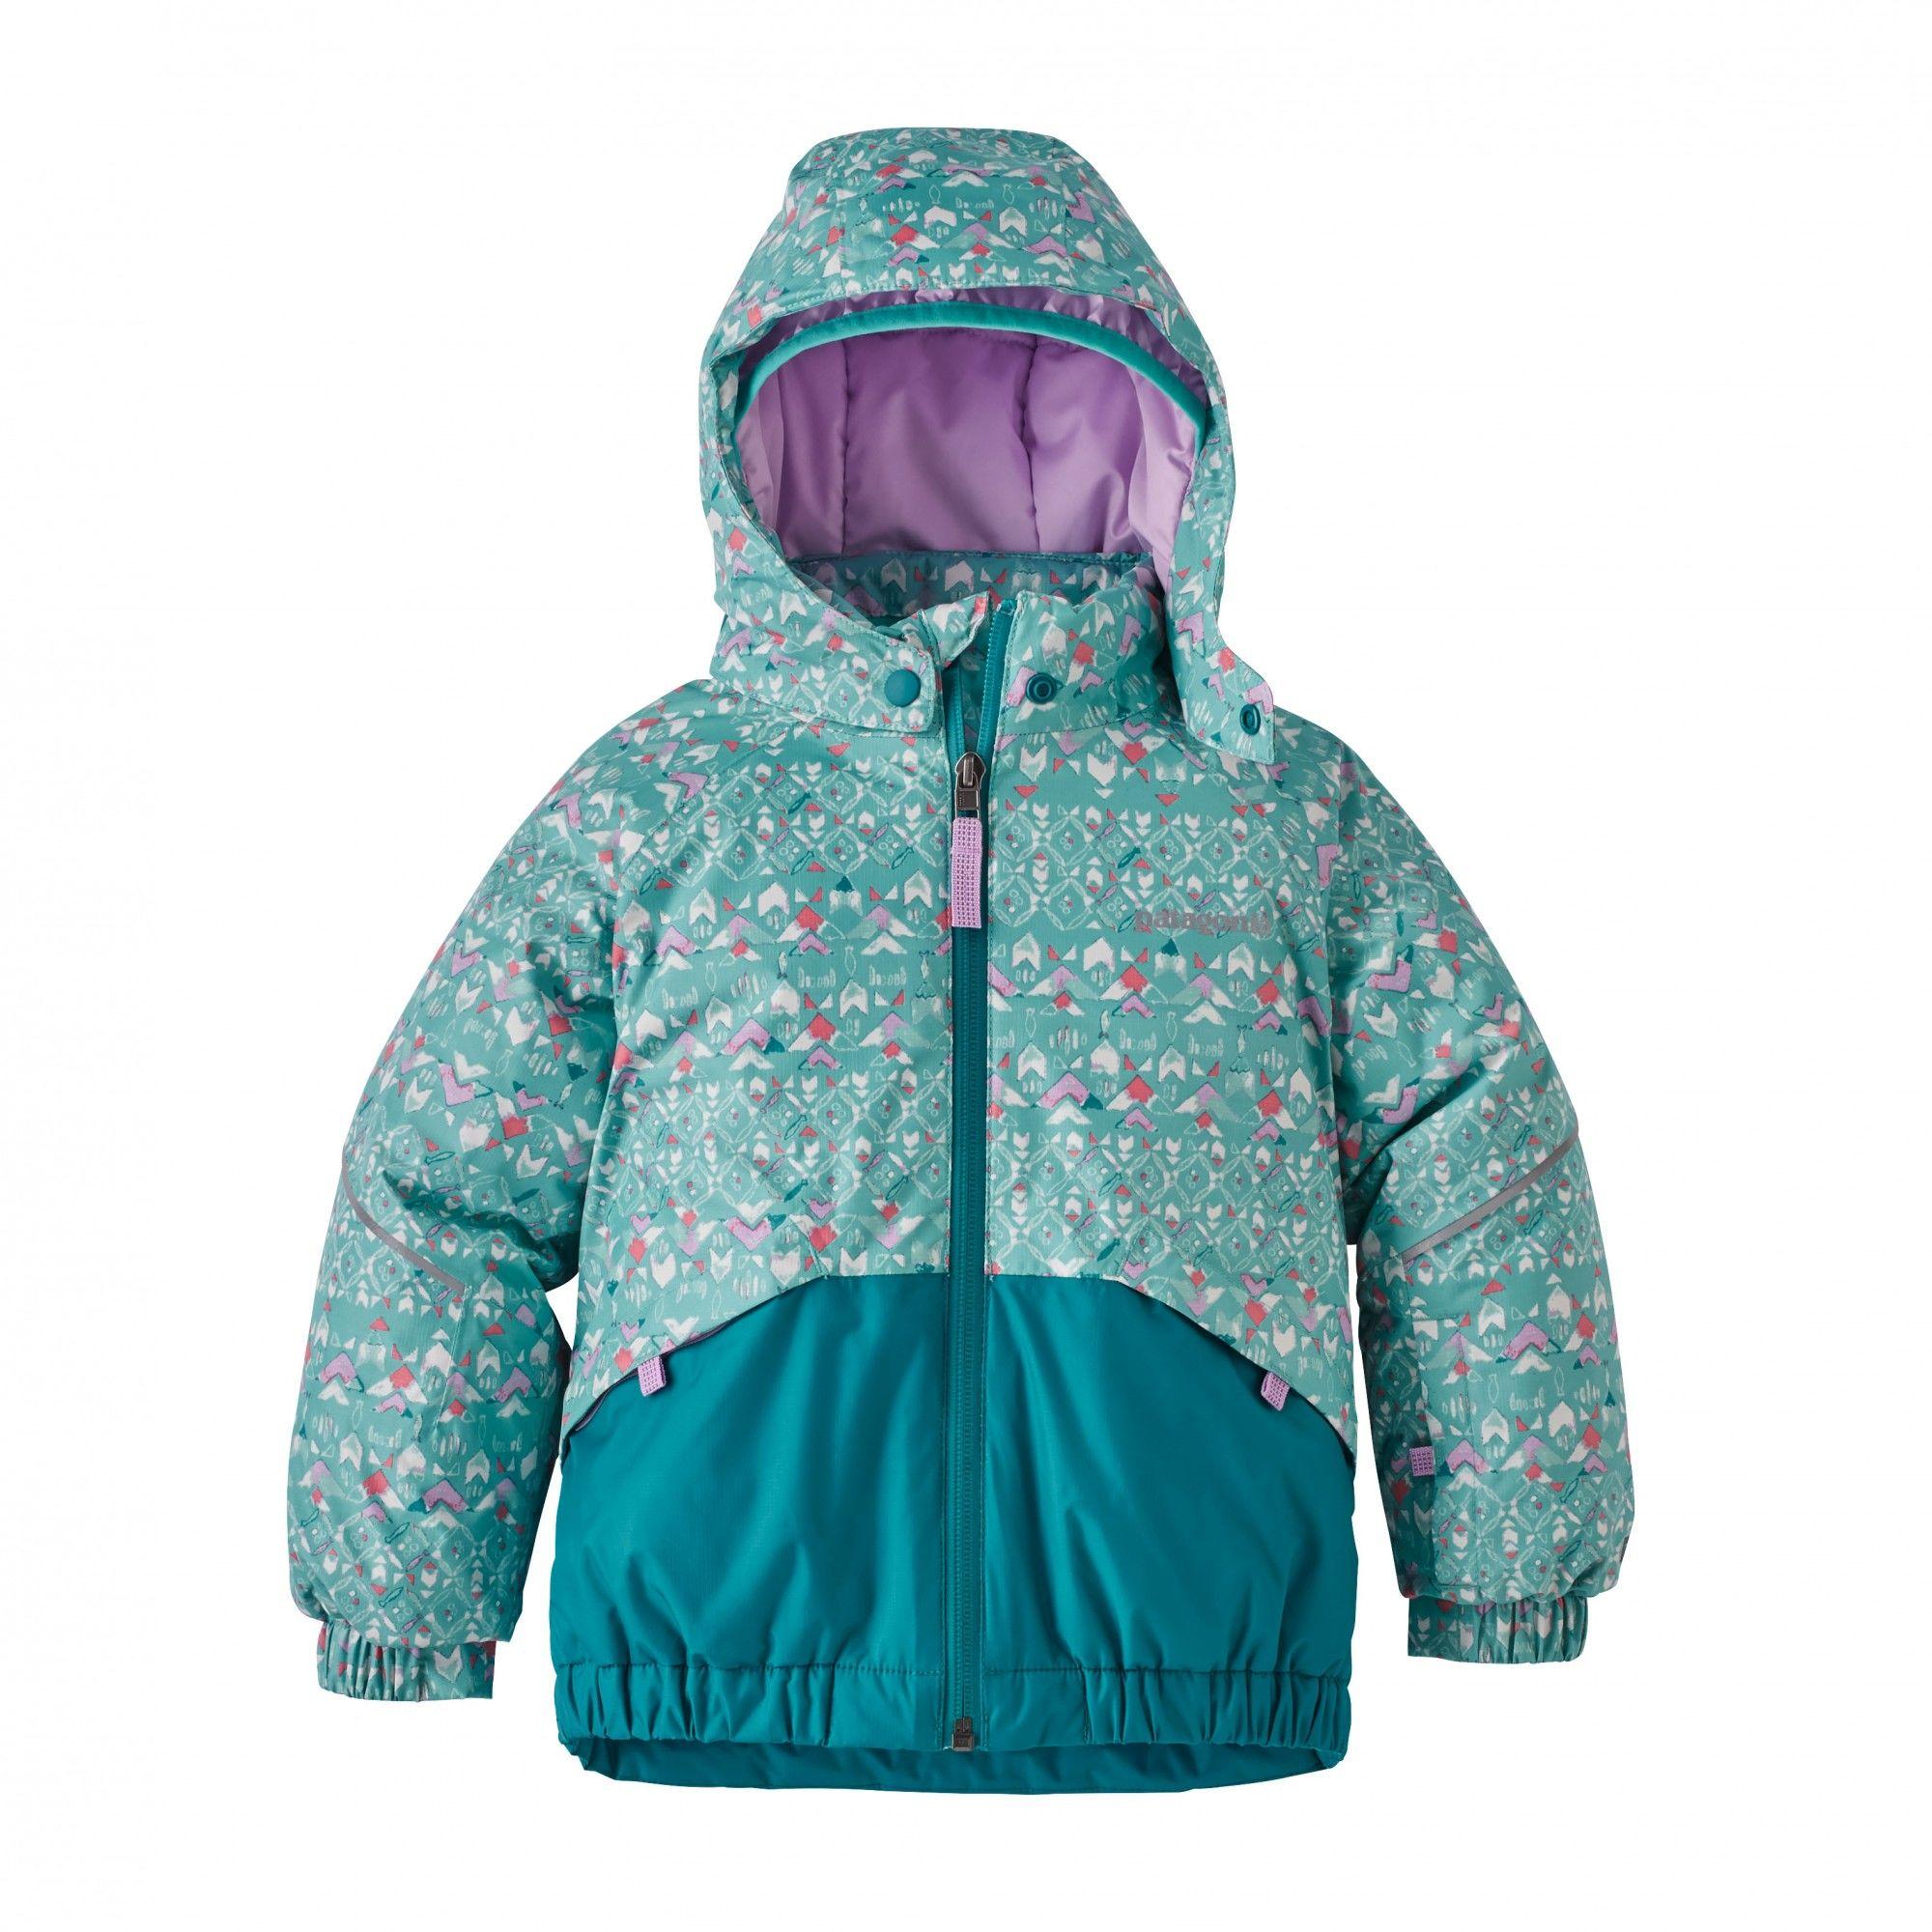 Patagonia Baby Snow Pile Jacket | Größe 3T,4T,5T | Kinder Freizeitjacke